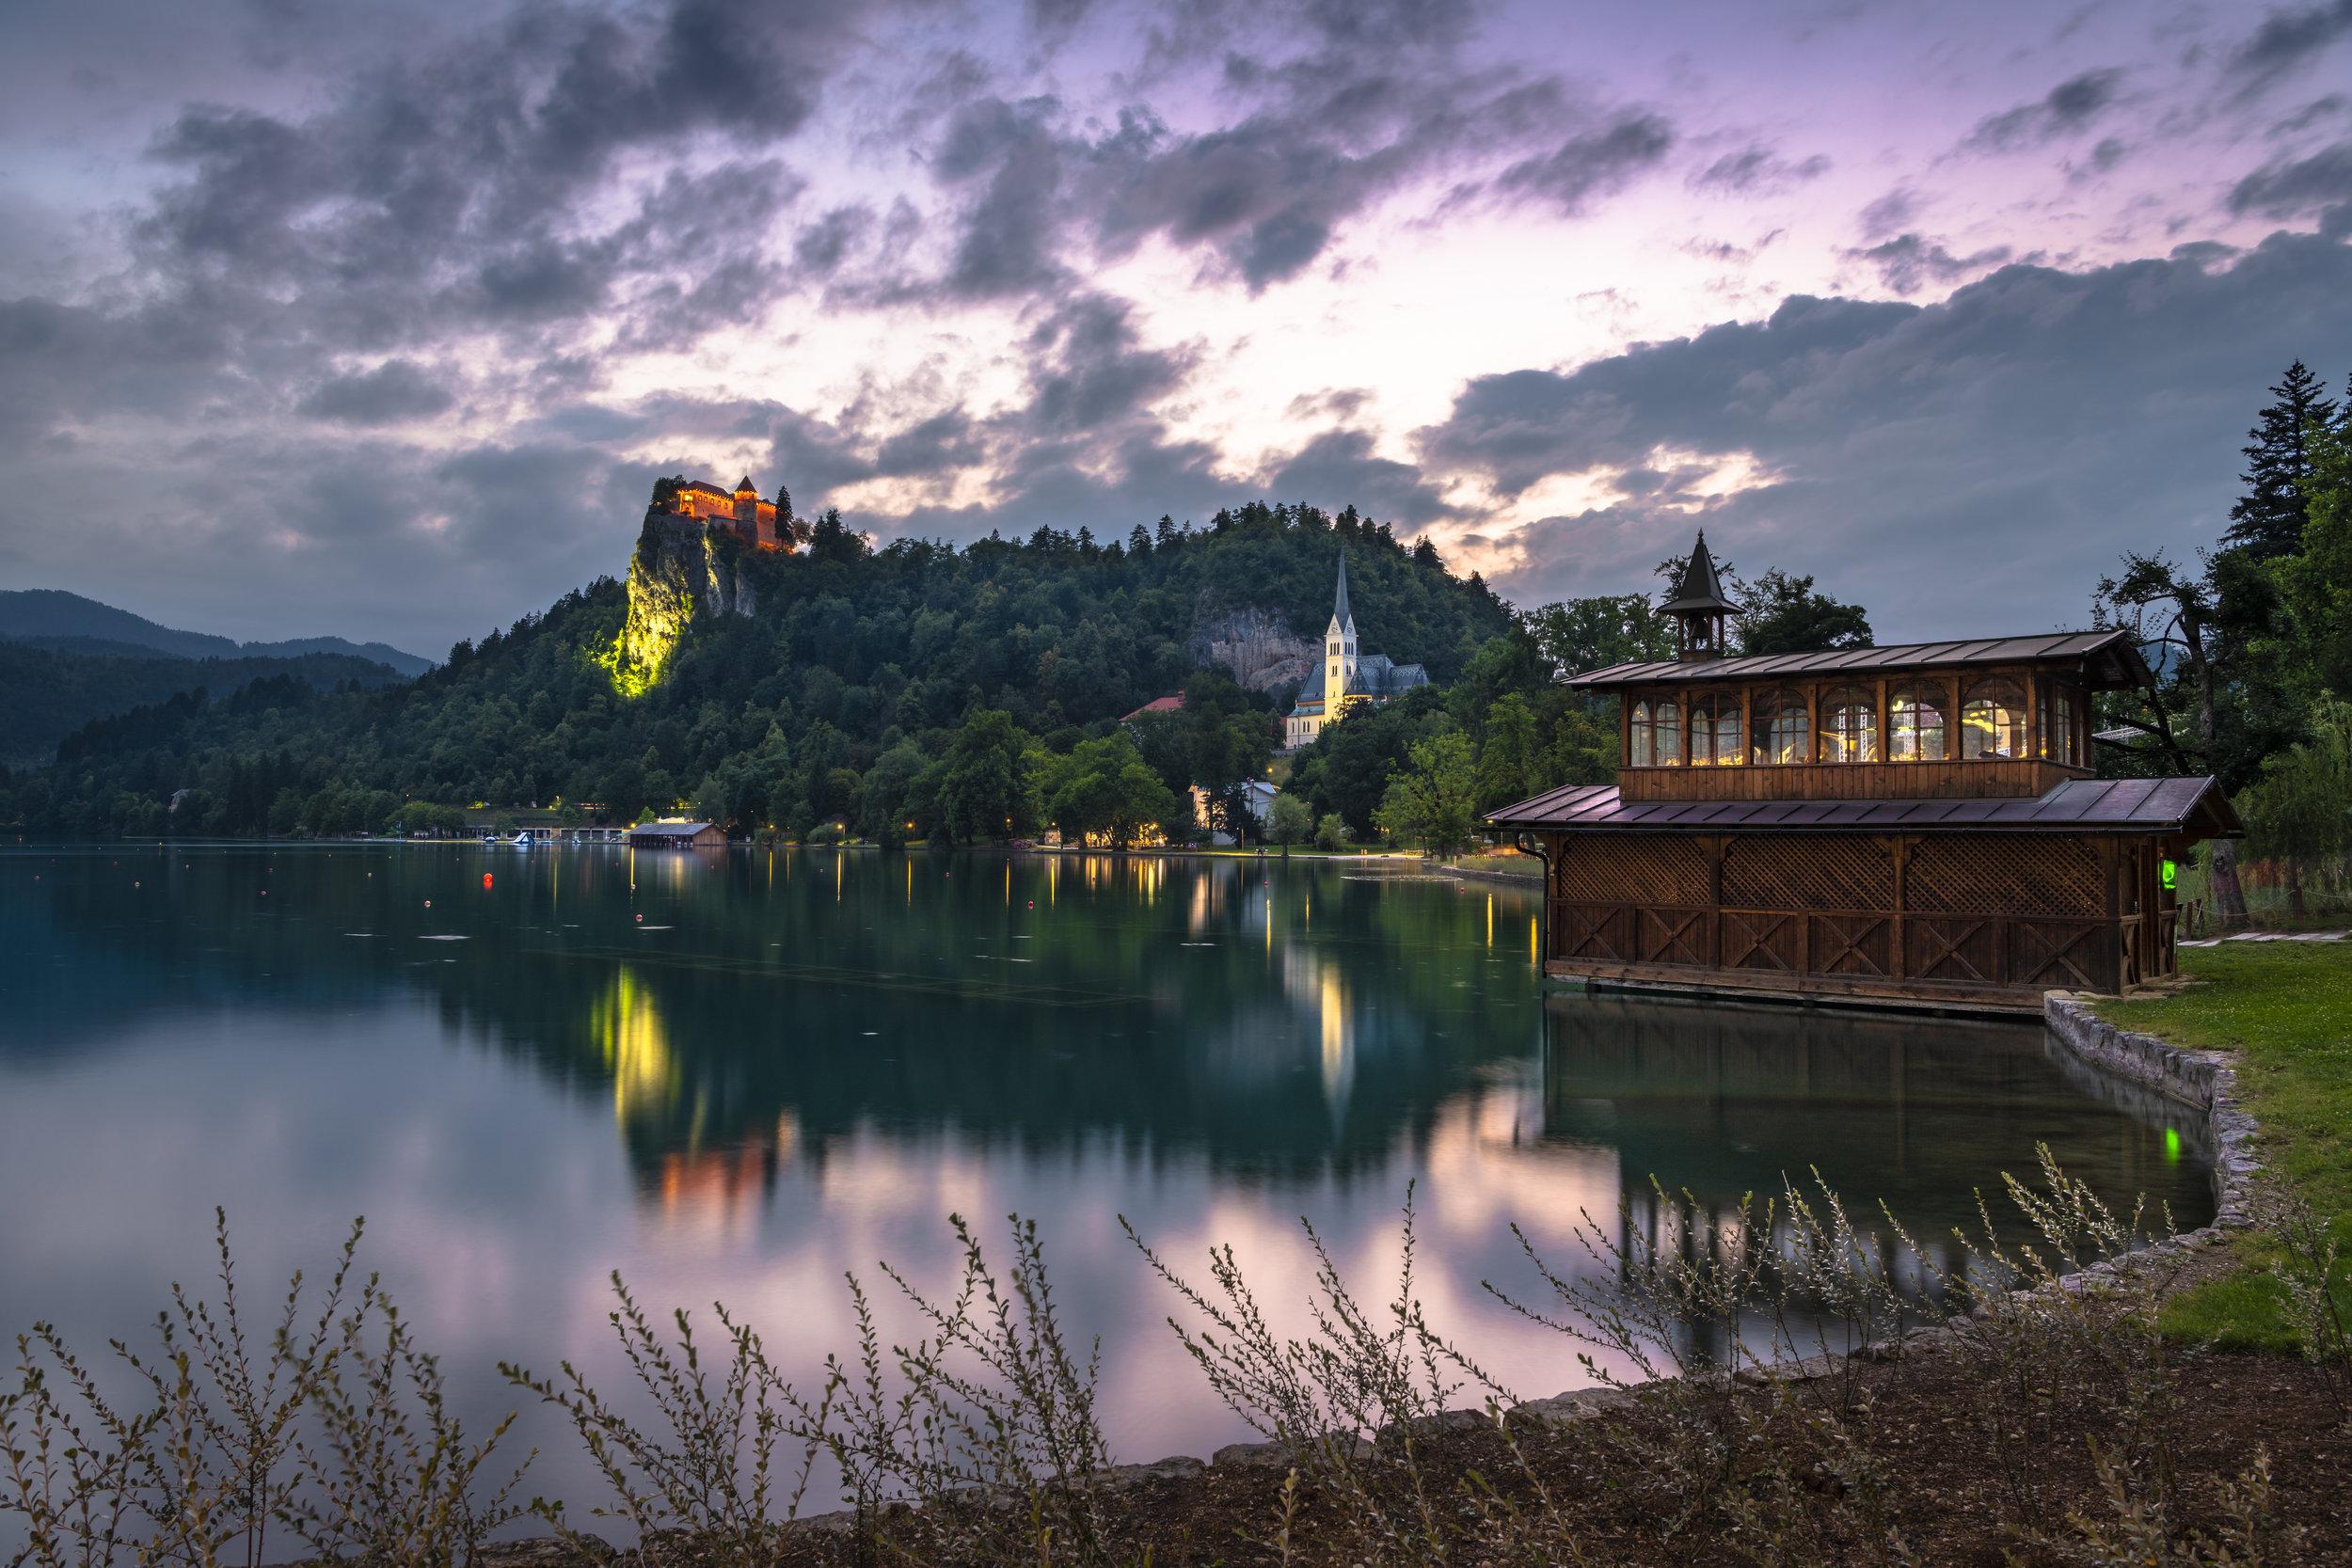 Bled2018 BoatHouse & Castle3 (1000 of 1).jpg